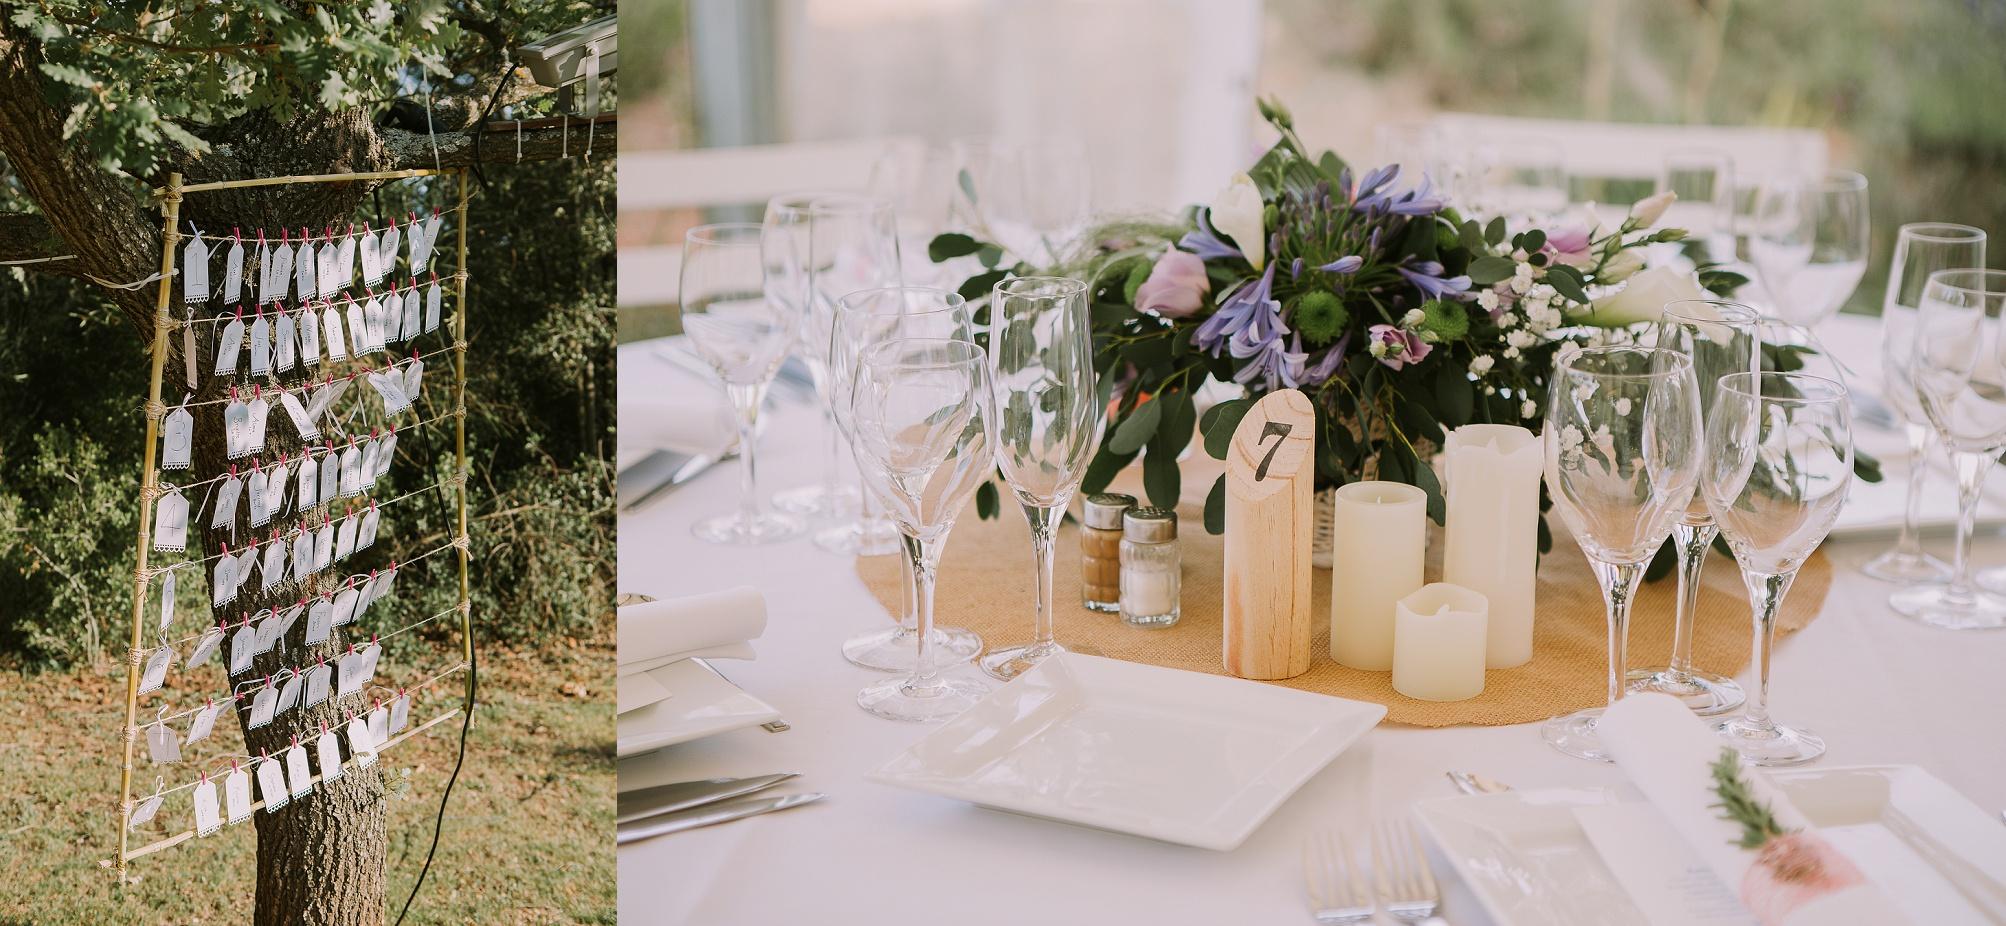 katerynaphotos-mariage-photographe-puyloubier-provence-aix-en-provence-sud-de-la-france_0411.jpg